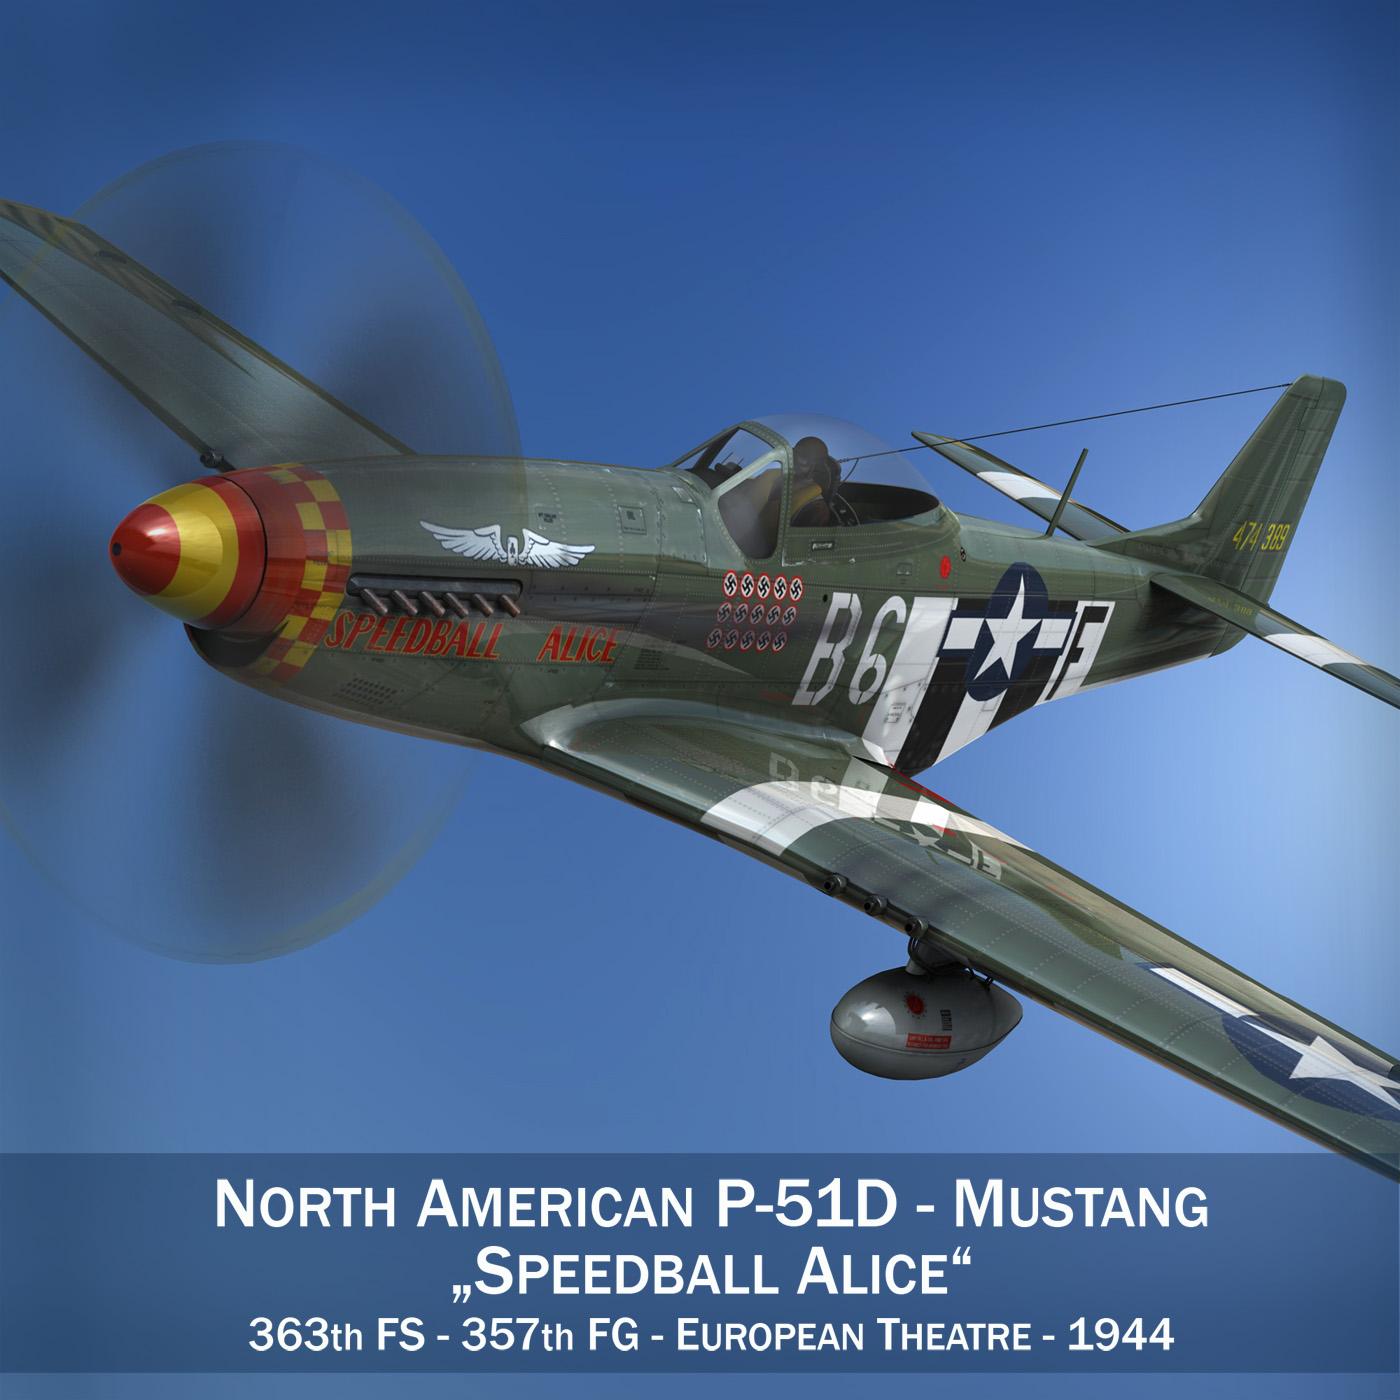 North American P-51D Mustang - Speedball Alice 3d model fbx c4d lwo lws lw obj 280309